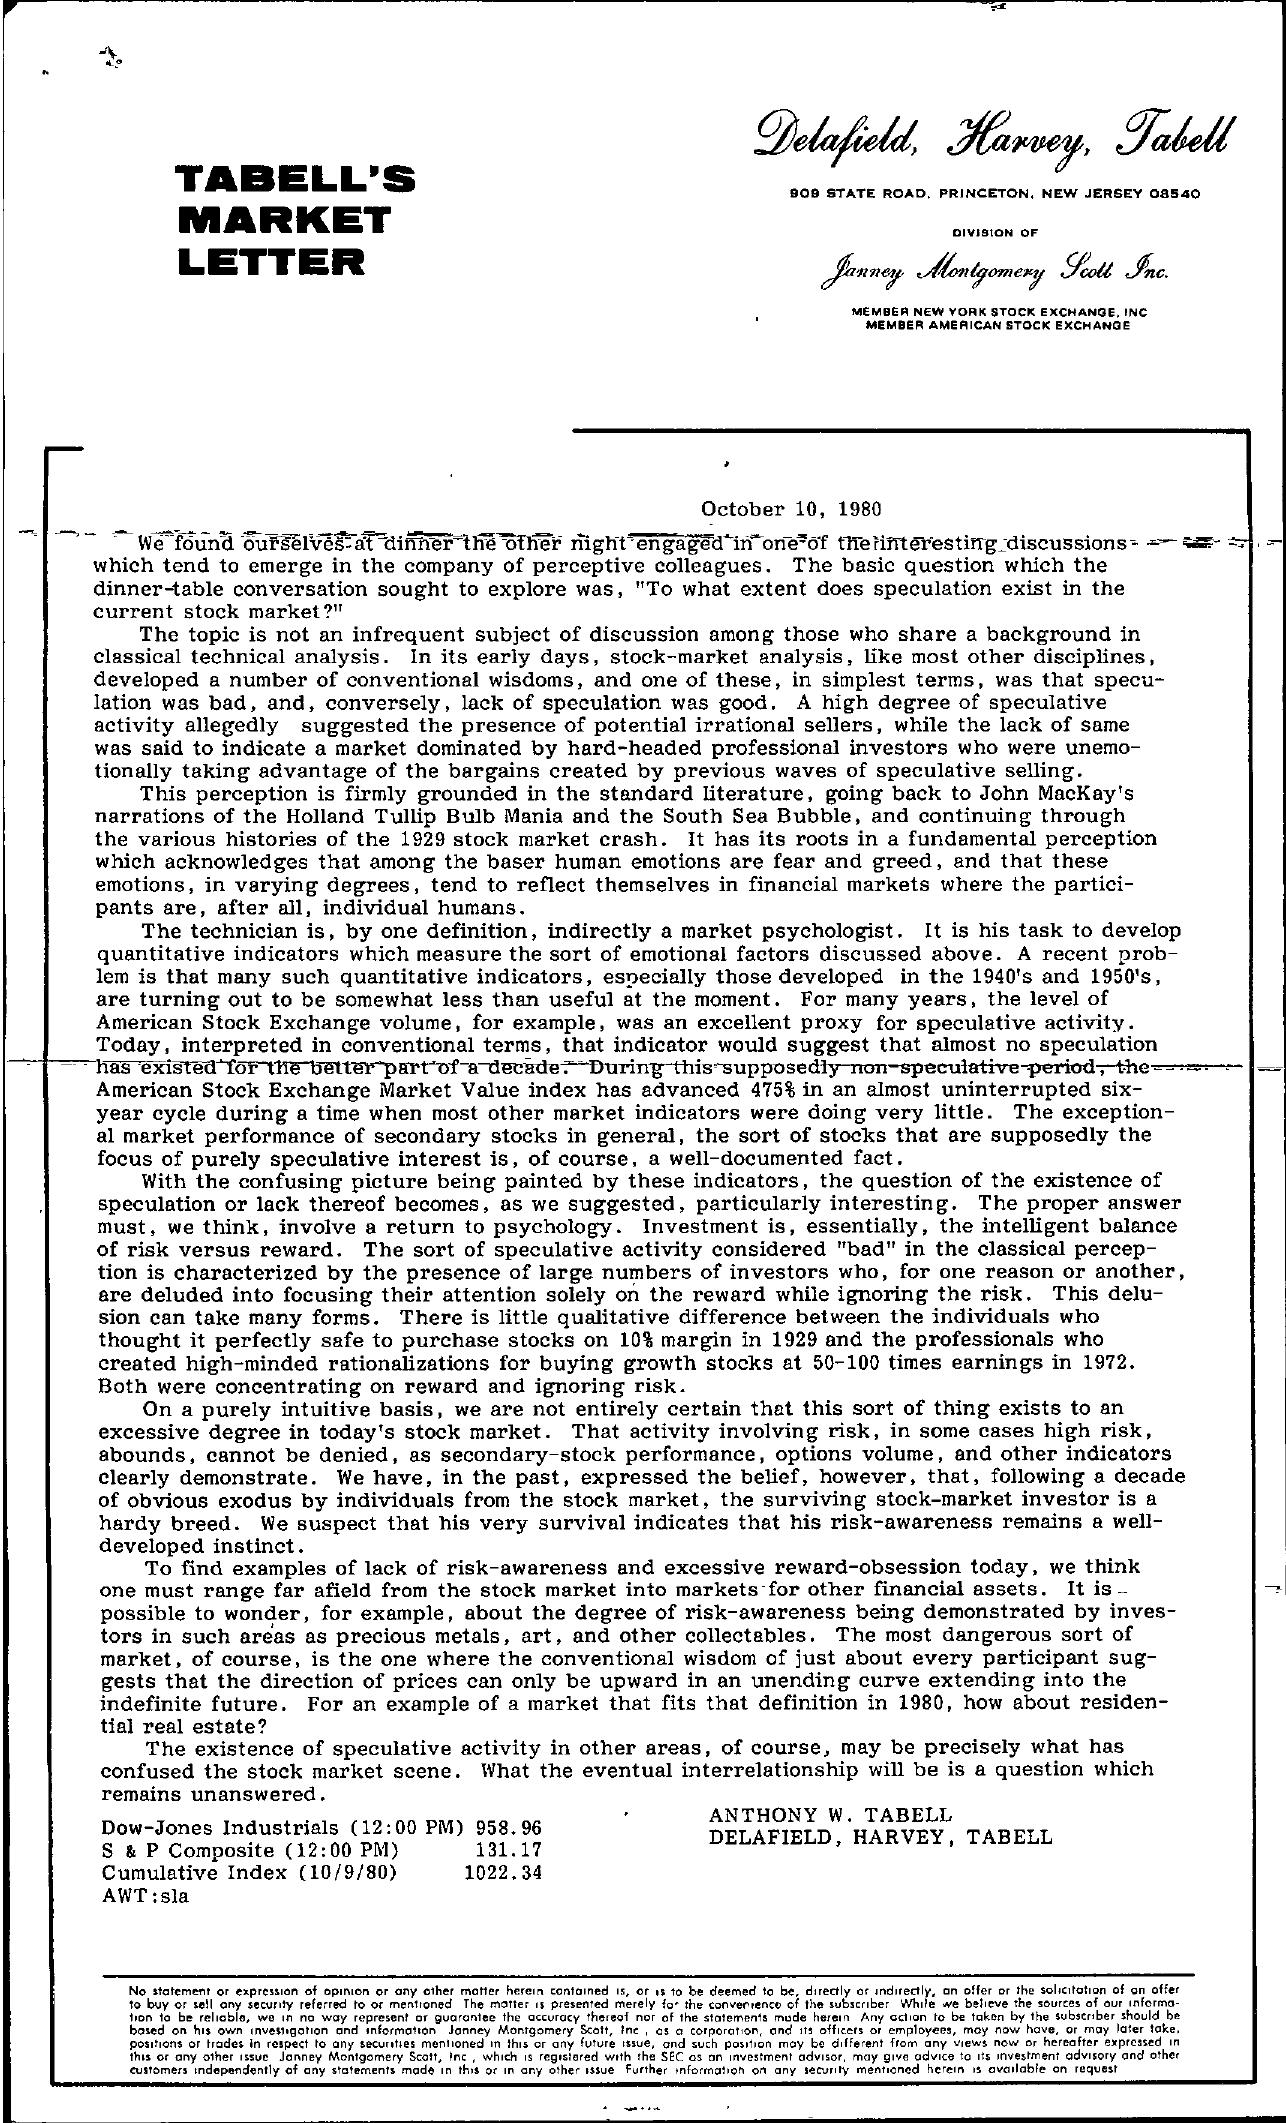 Tabell's Market Letter - October 10, 1980